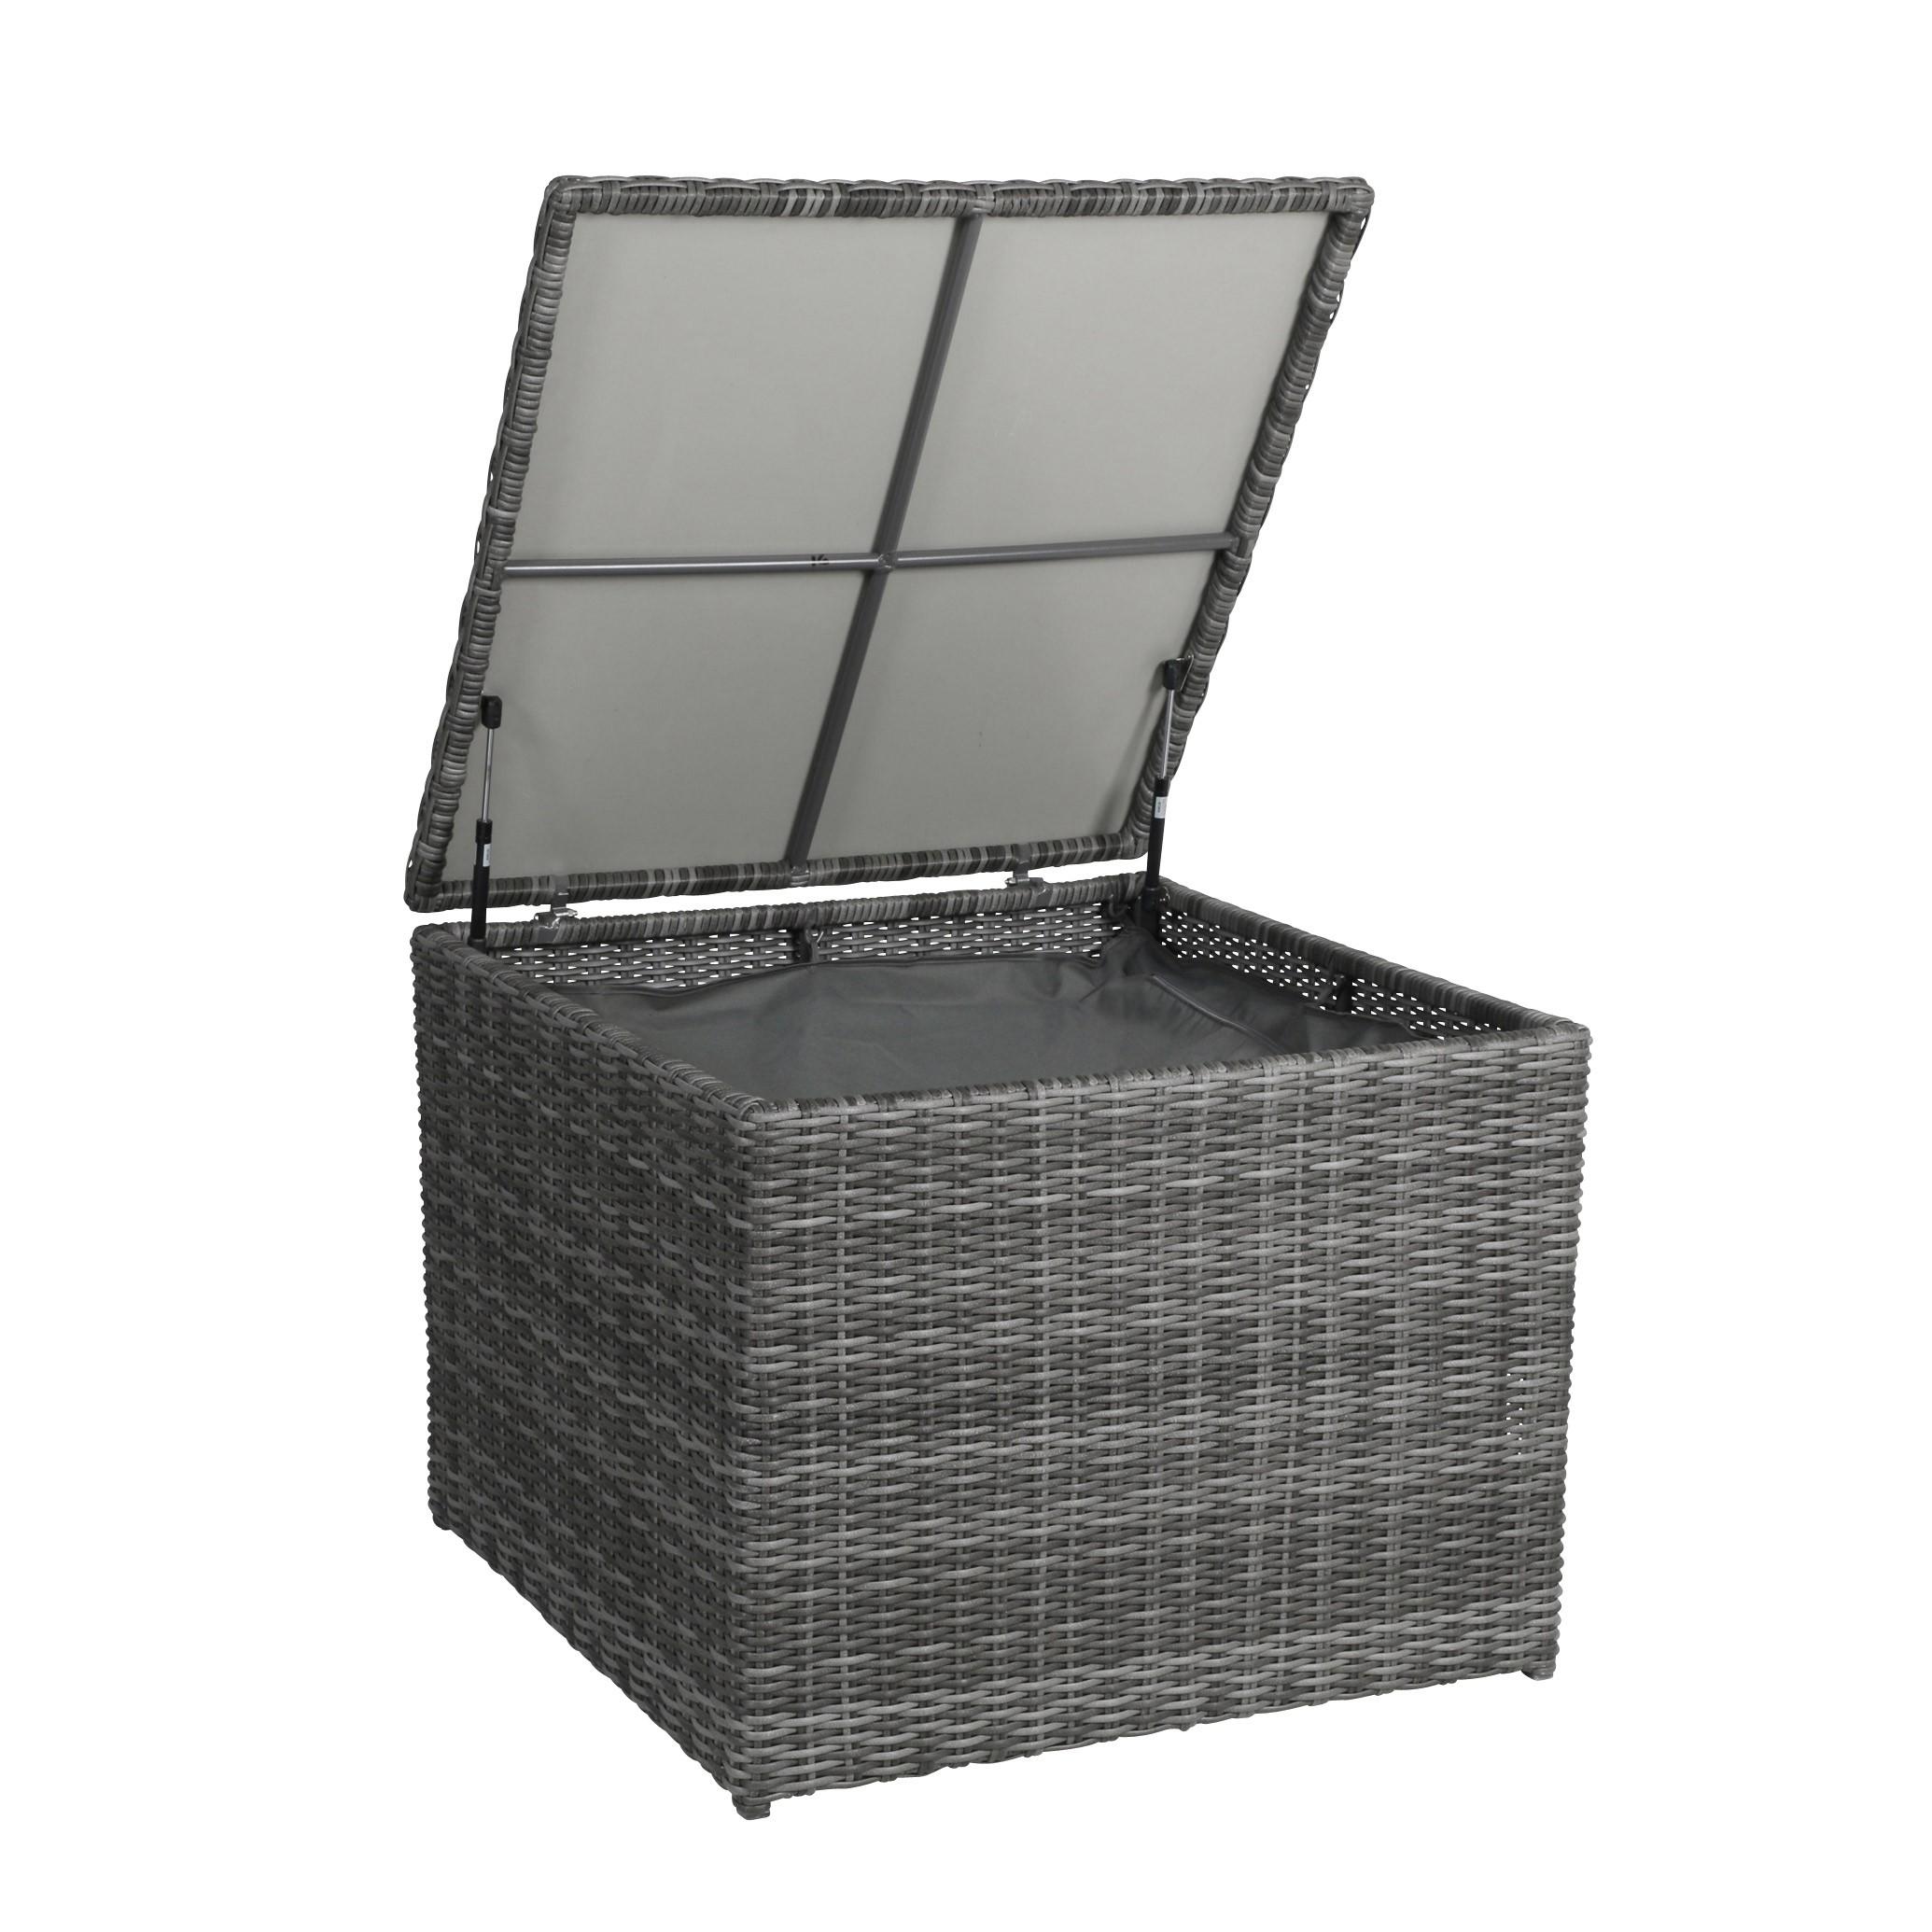 Kissenbox /  Auflagenbox Bari greemotion Polyrattan grau 80x80cm Bild 2